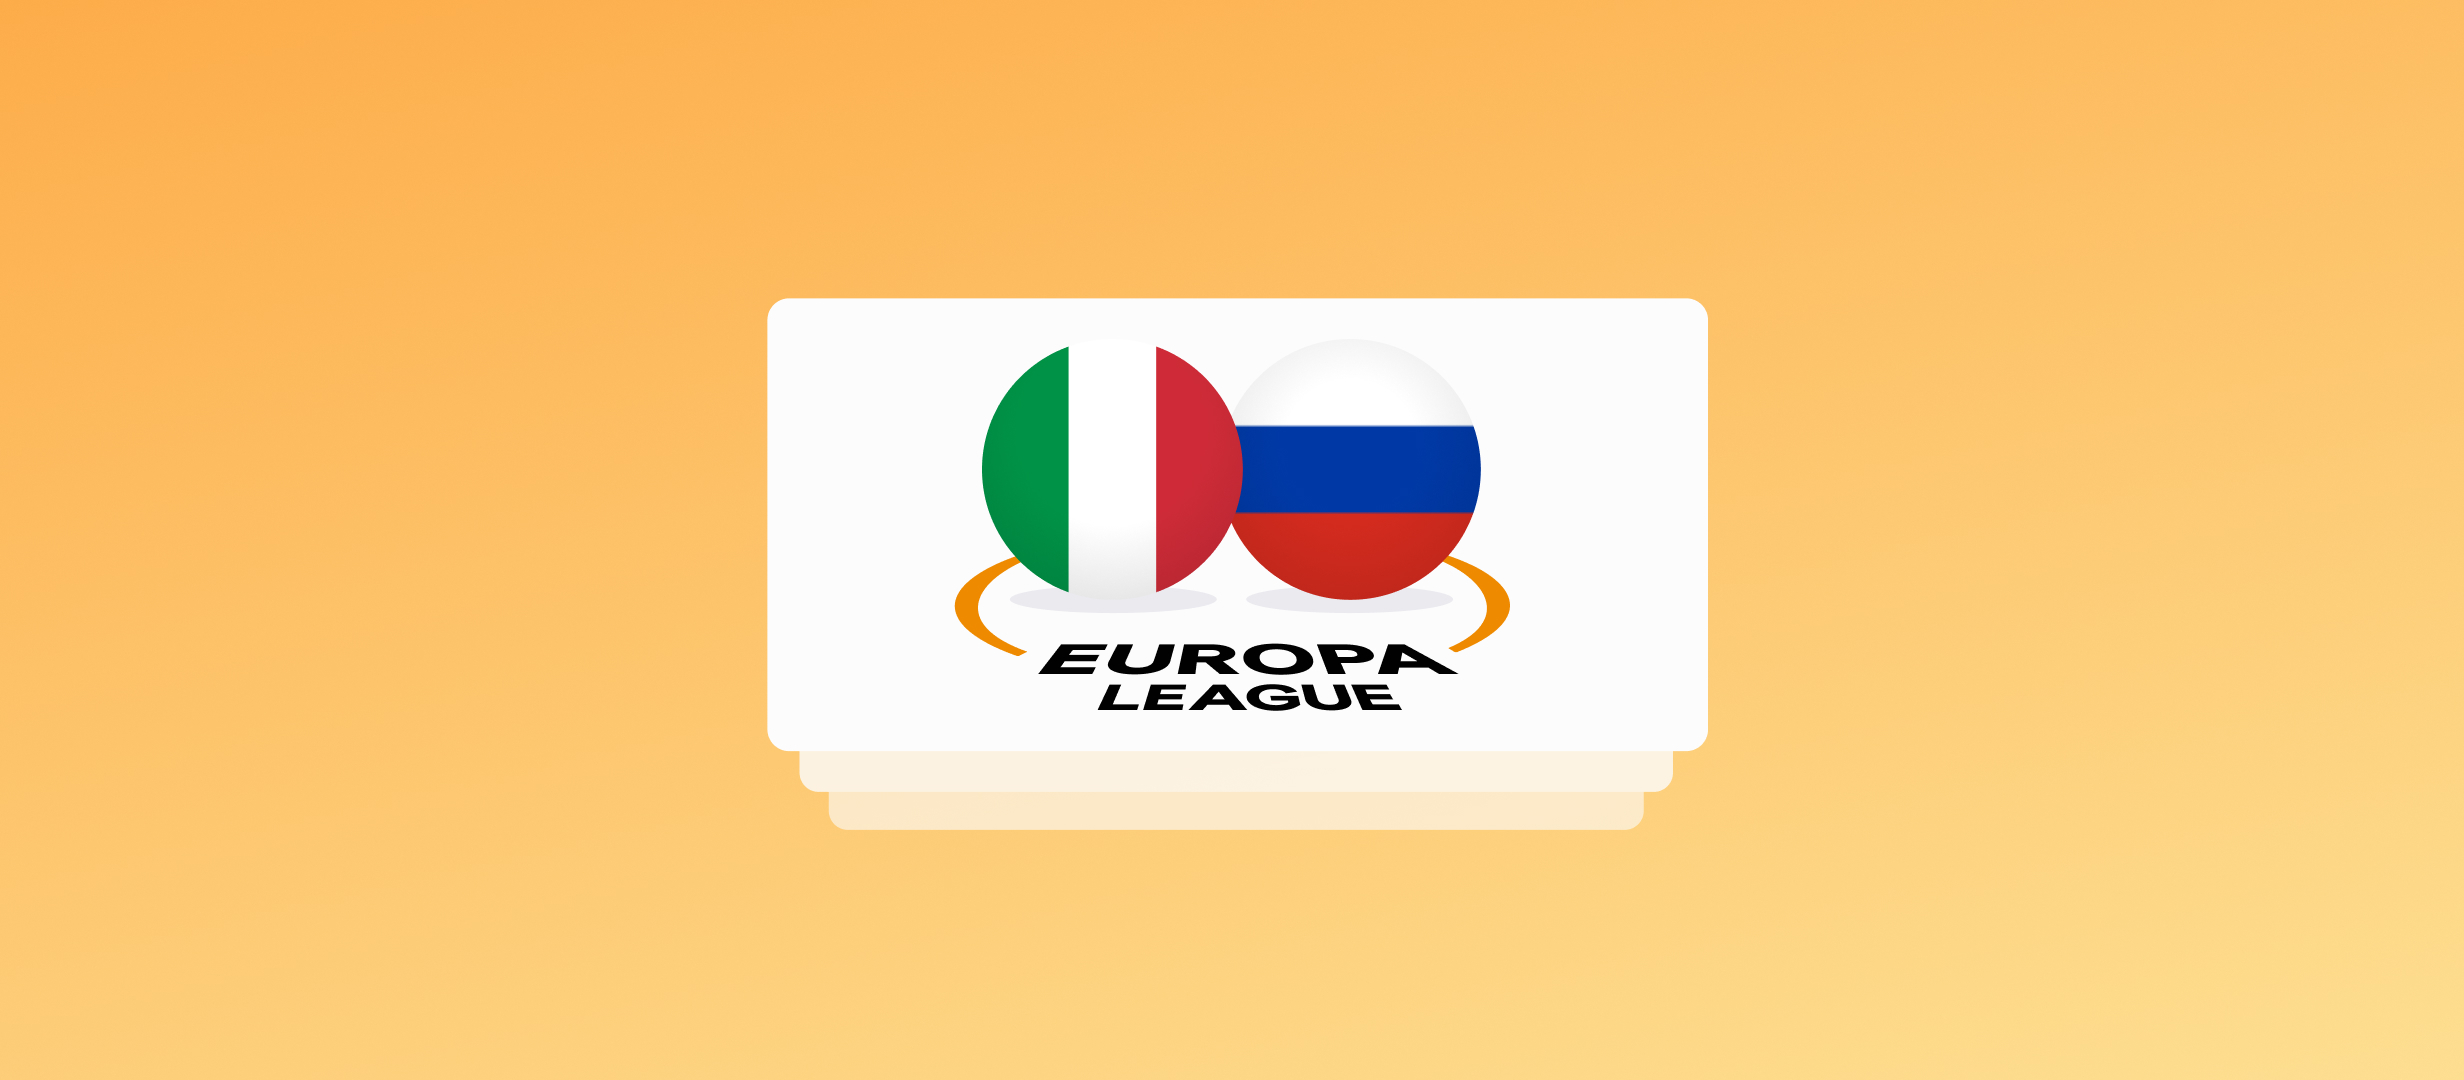 Итальянские будни в «Бетсити»: разбираем линию на матчи «Спартака» и «Локо» с «Наполи» и «Лацио»